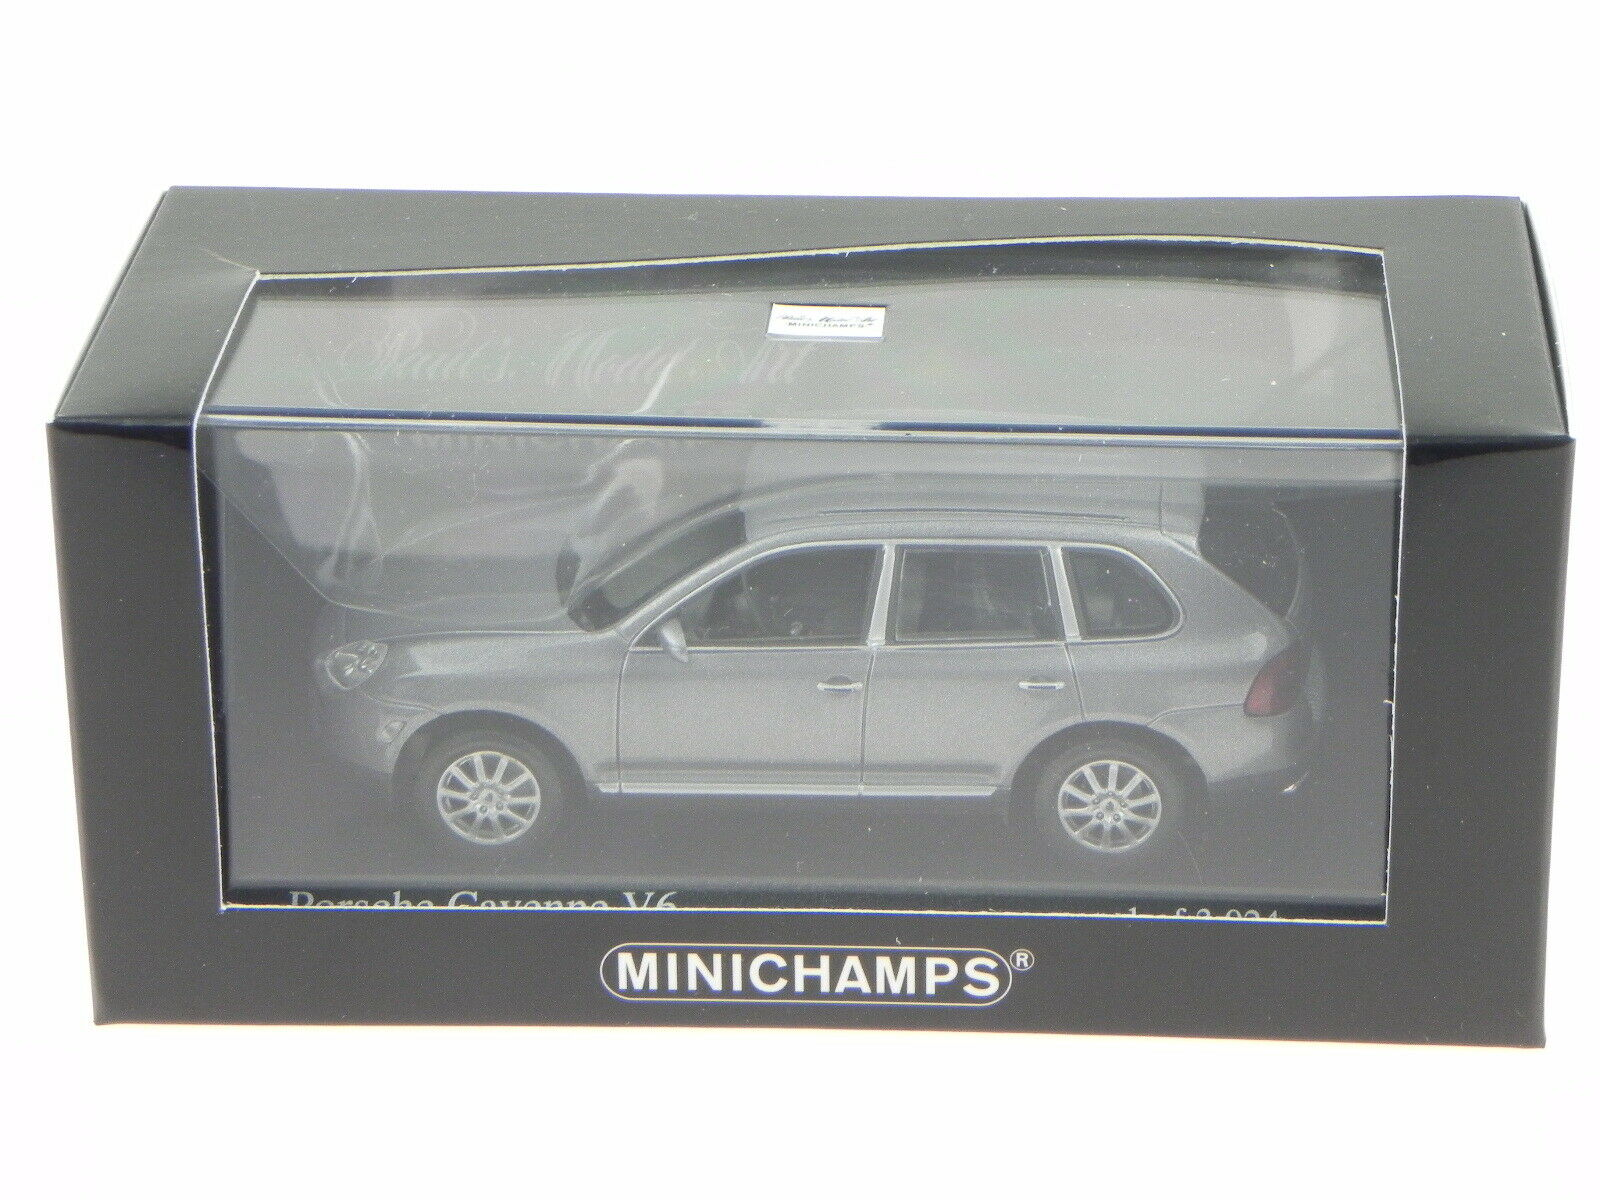 2002 Porsche Cayenne V6 Diecast Model Car Minichamps 400061010